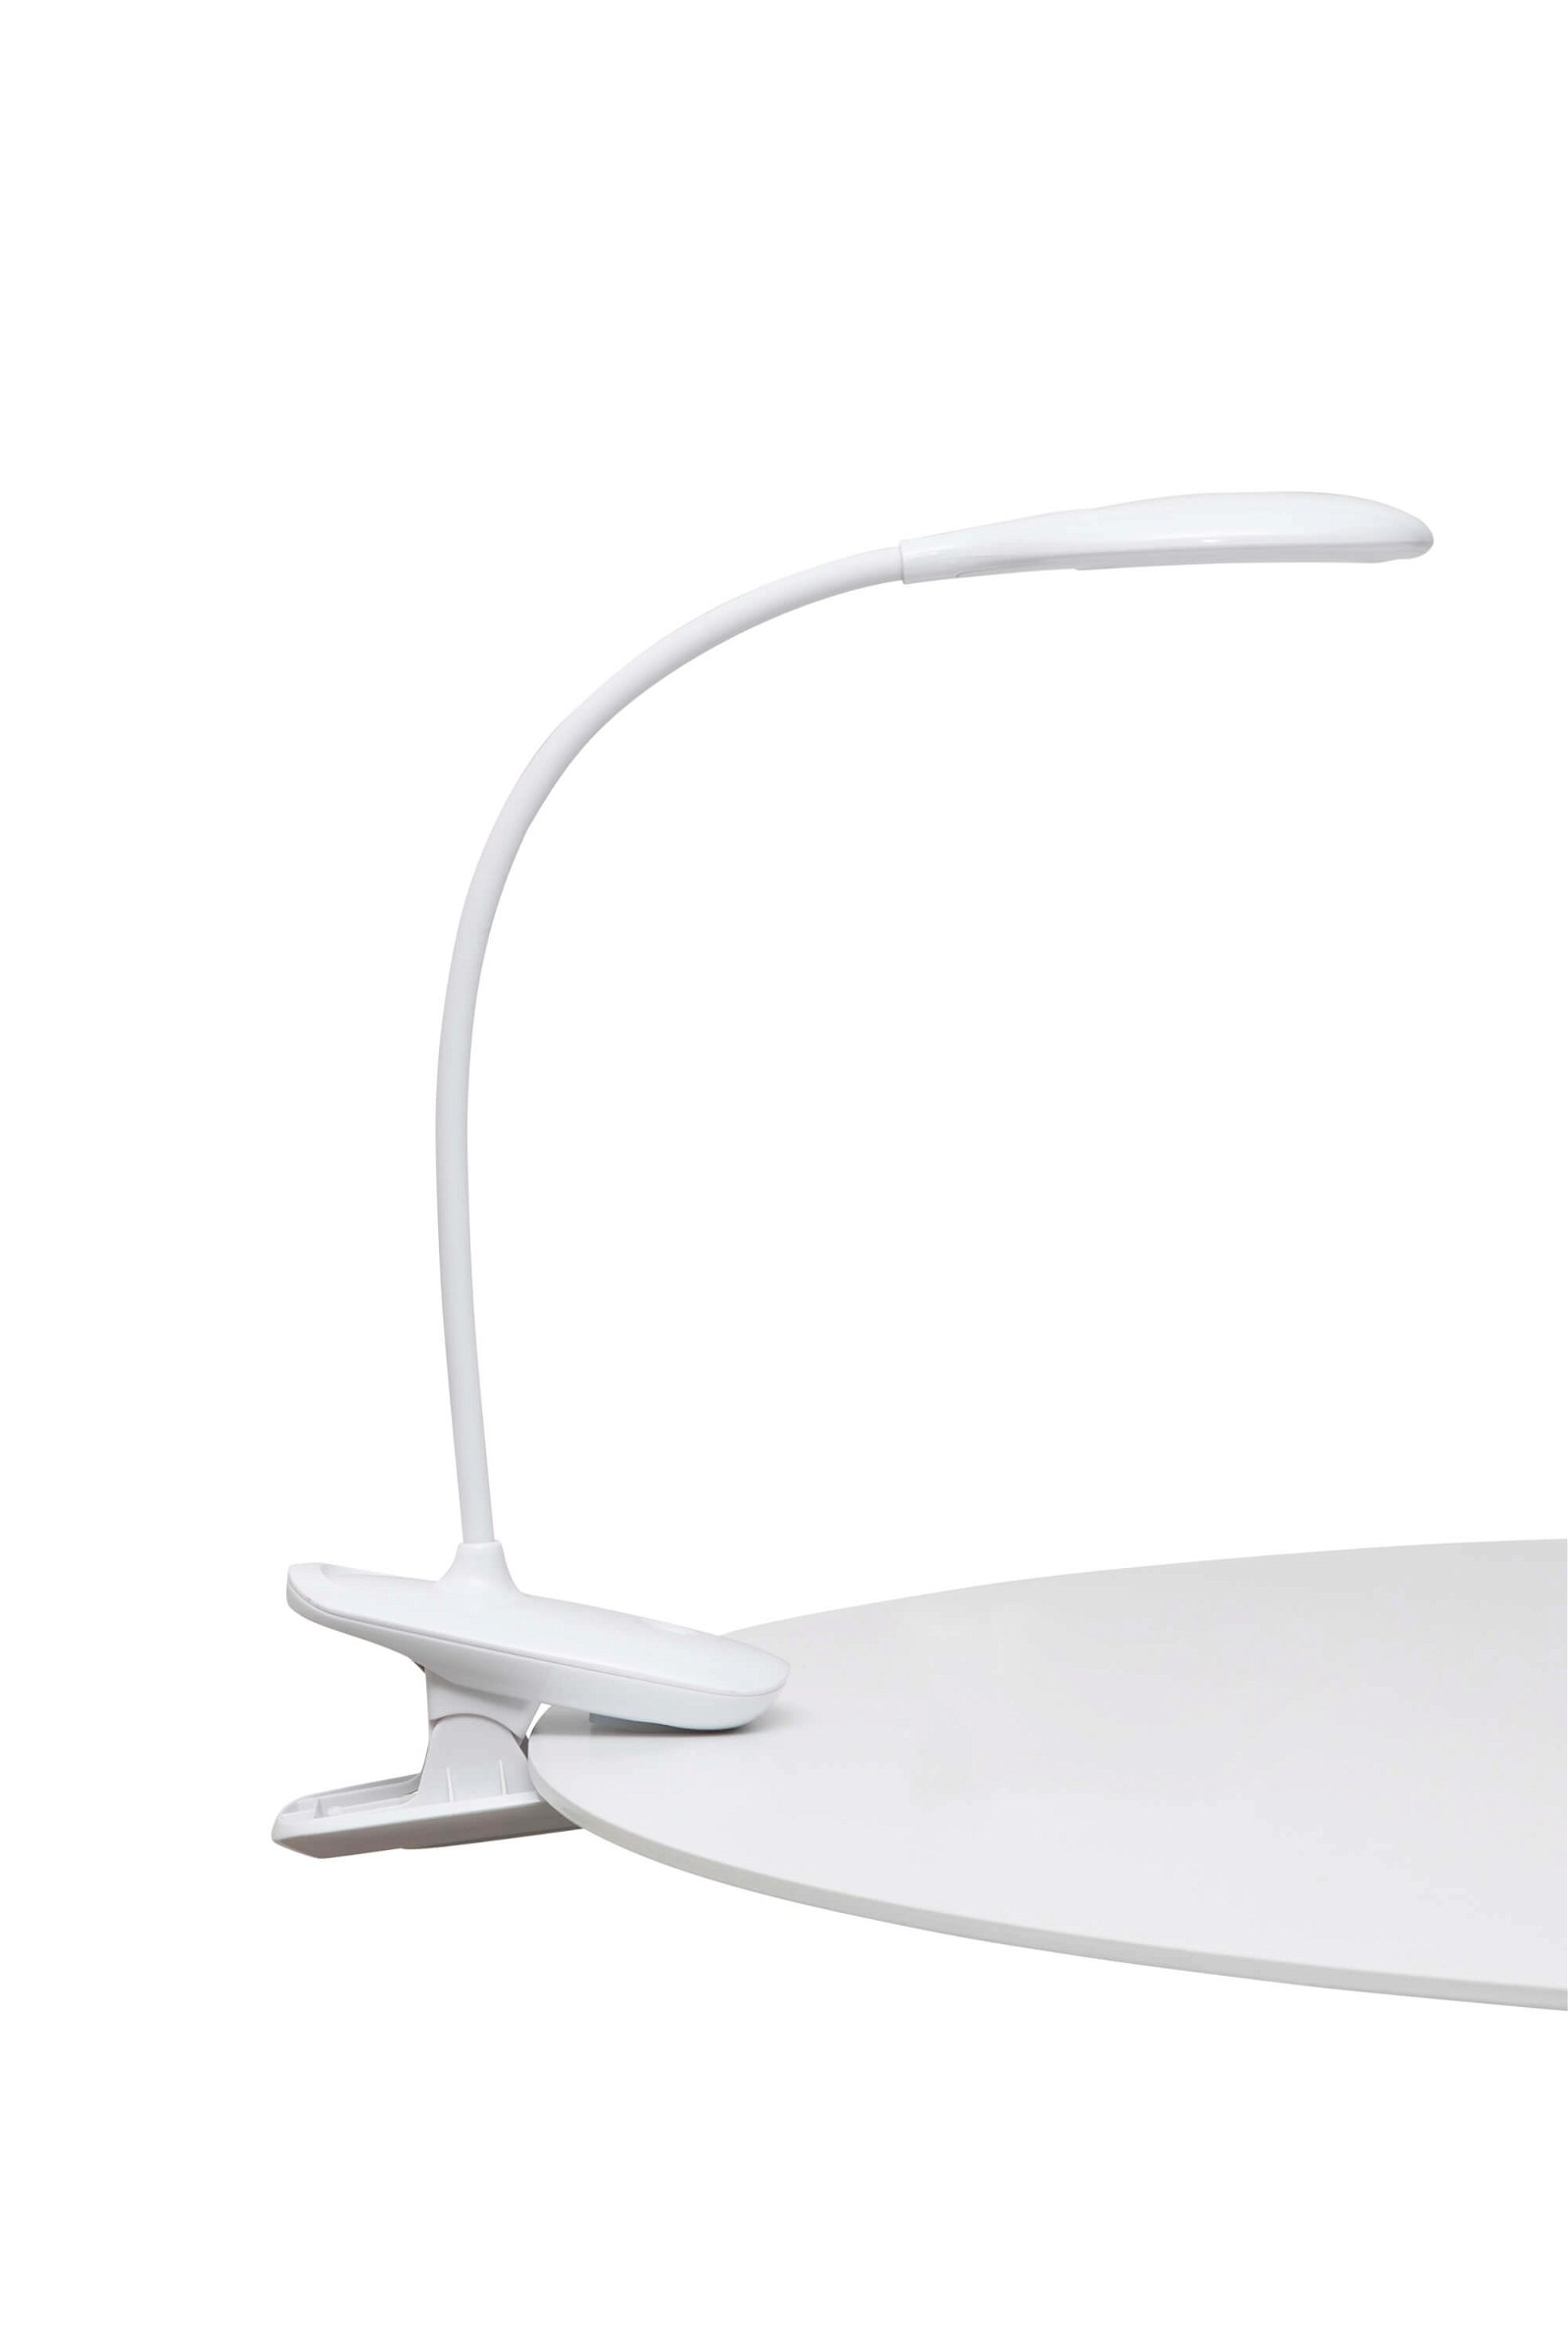 Akku LED-Leuchte MAULjack, dimmbar